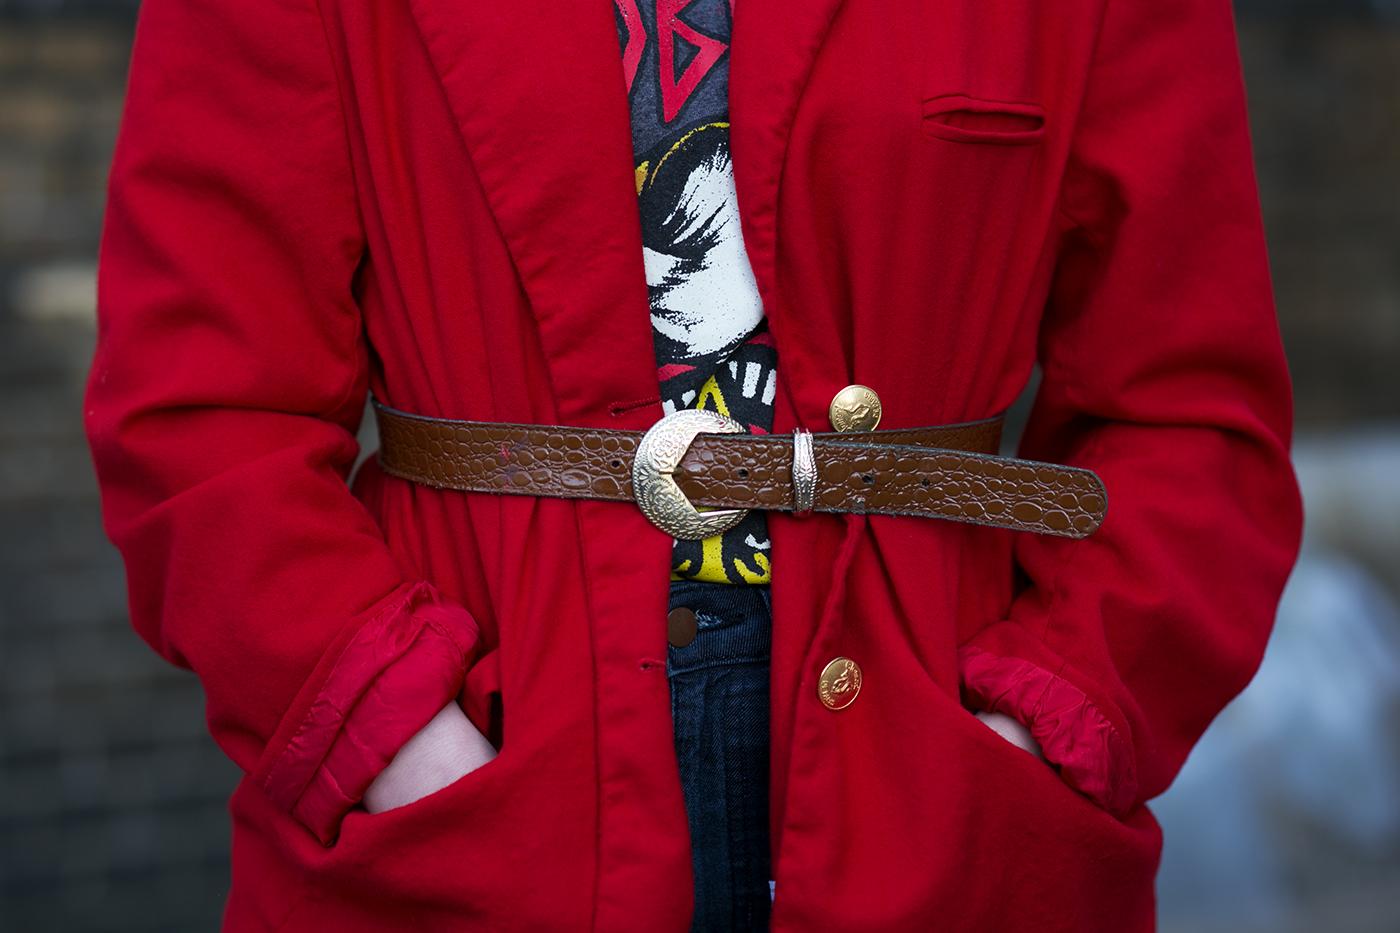 Taillengürtel Blazer Outfit